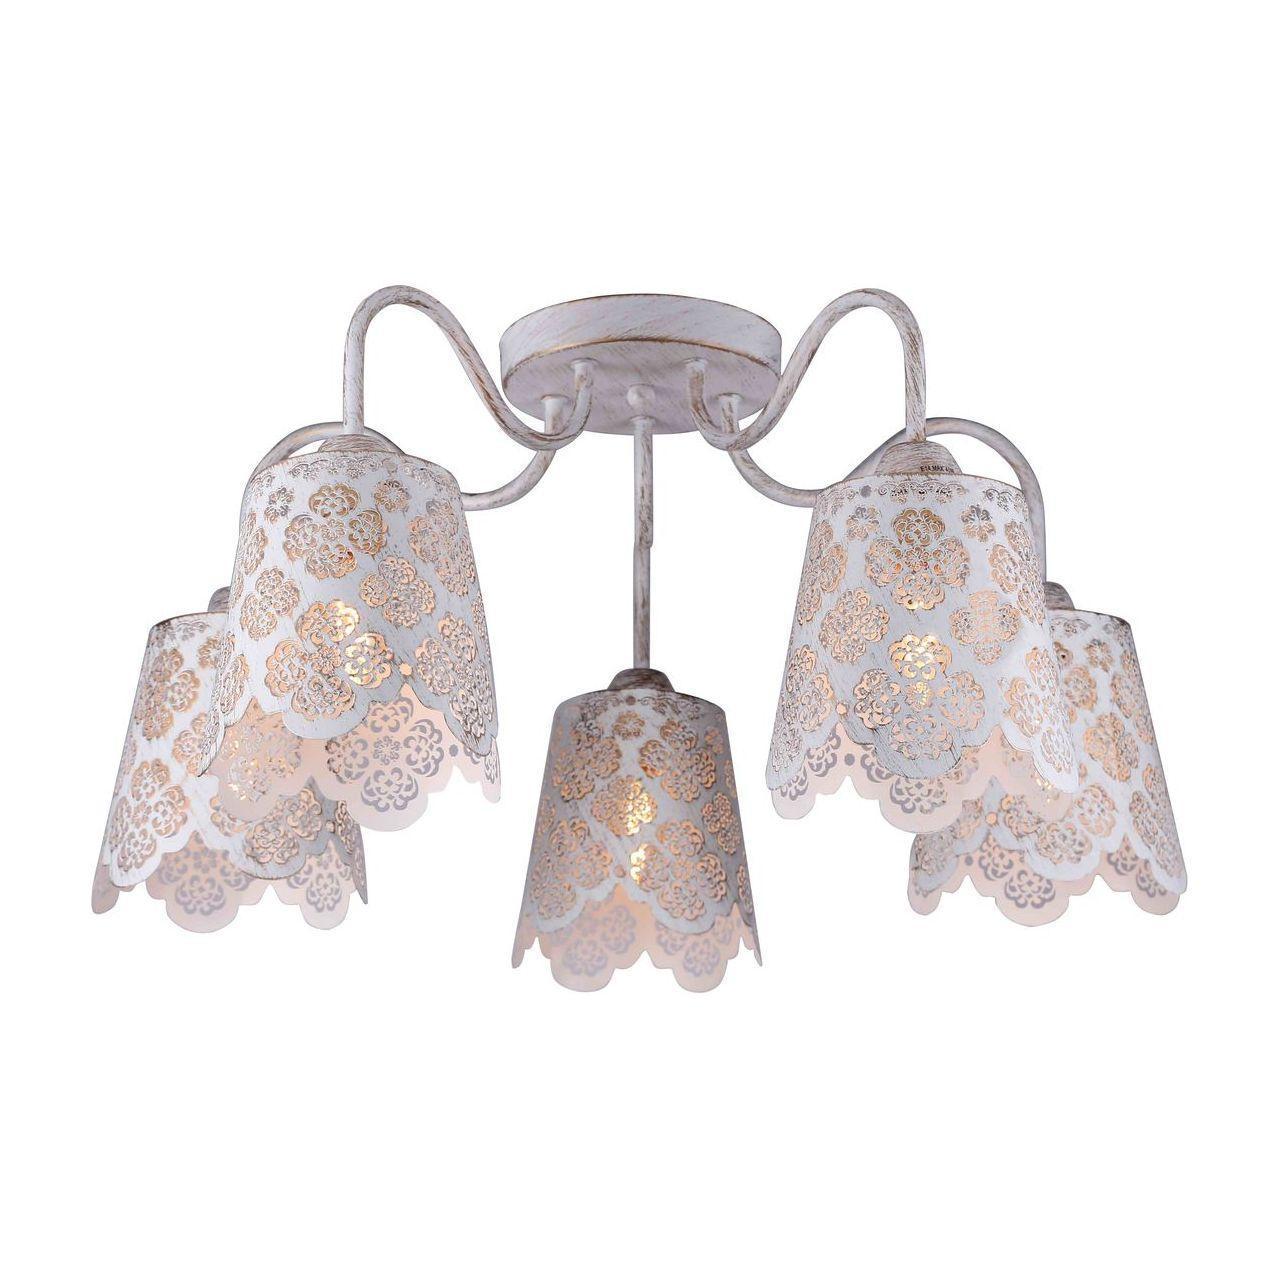 Люстра Arte Lamp A2032PL-5WG потолочная потолочная люстра arte lamp a2032pl 5wg